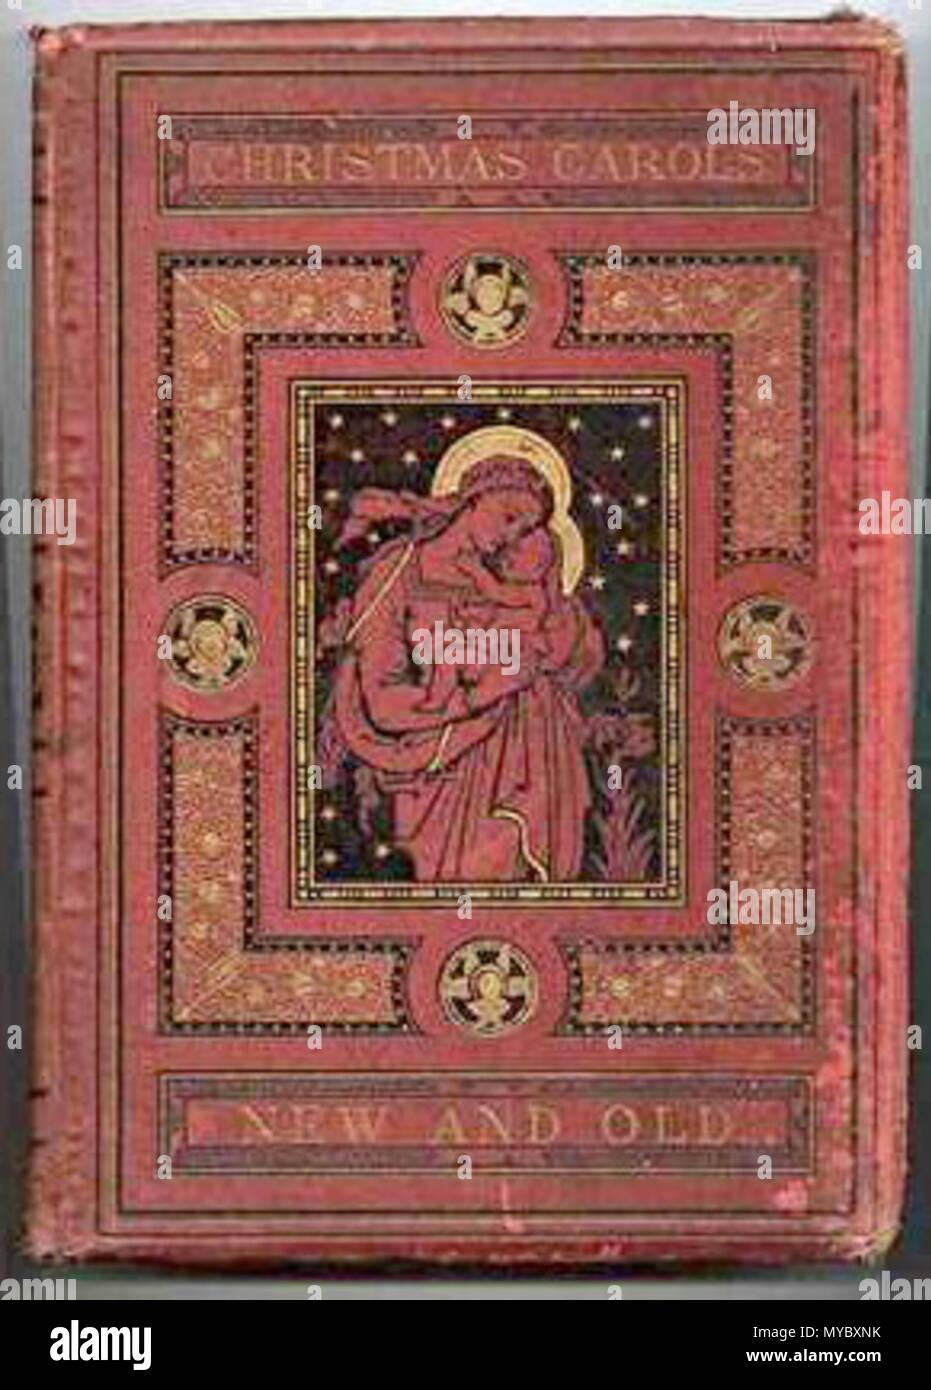 Old Christmas Carols.English Christmas Carols New And Old By Rev H R Bramley